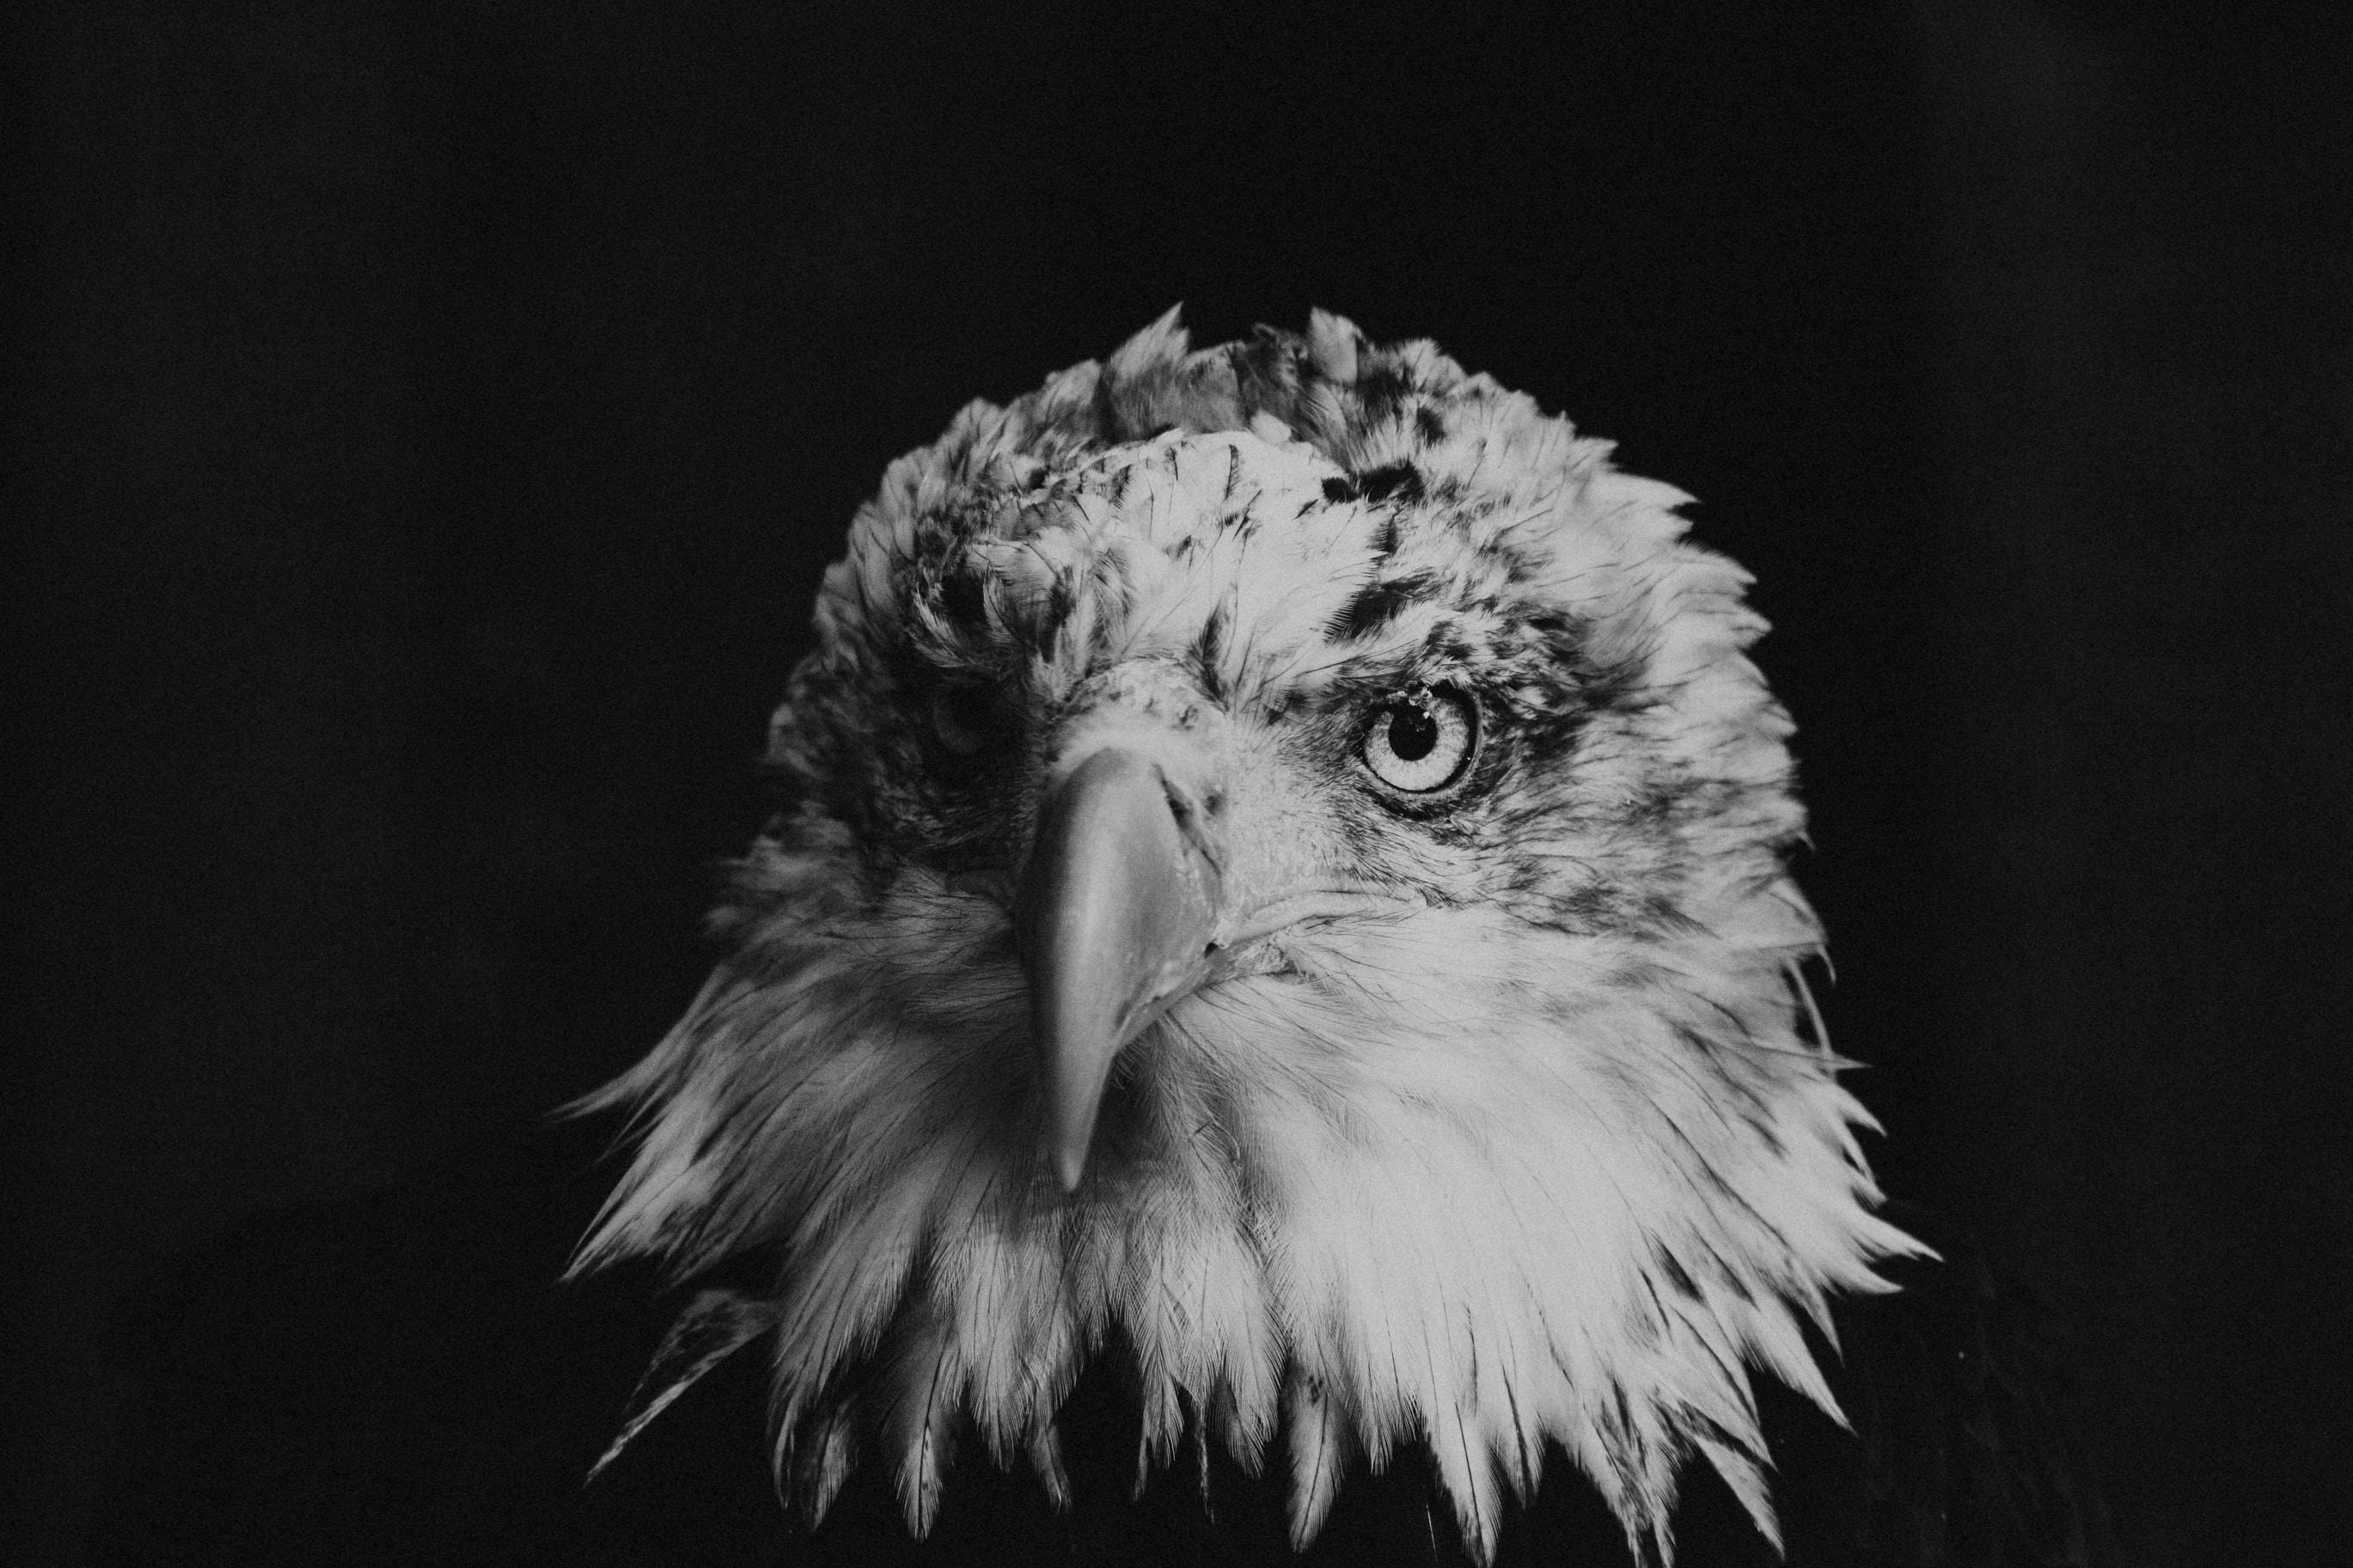 bald eagle greyscale photography